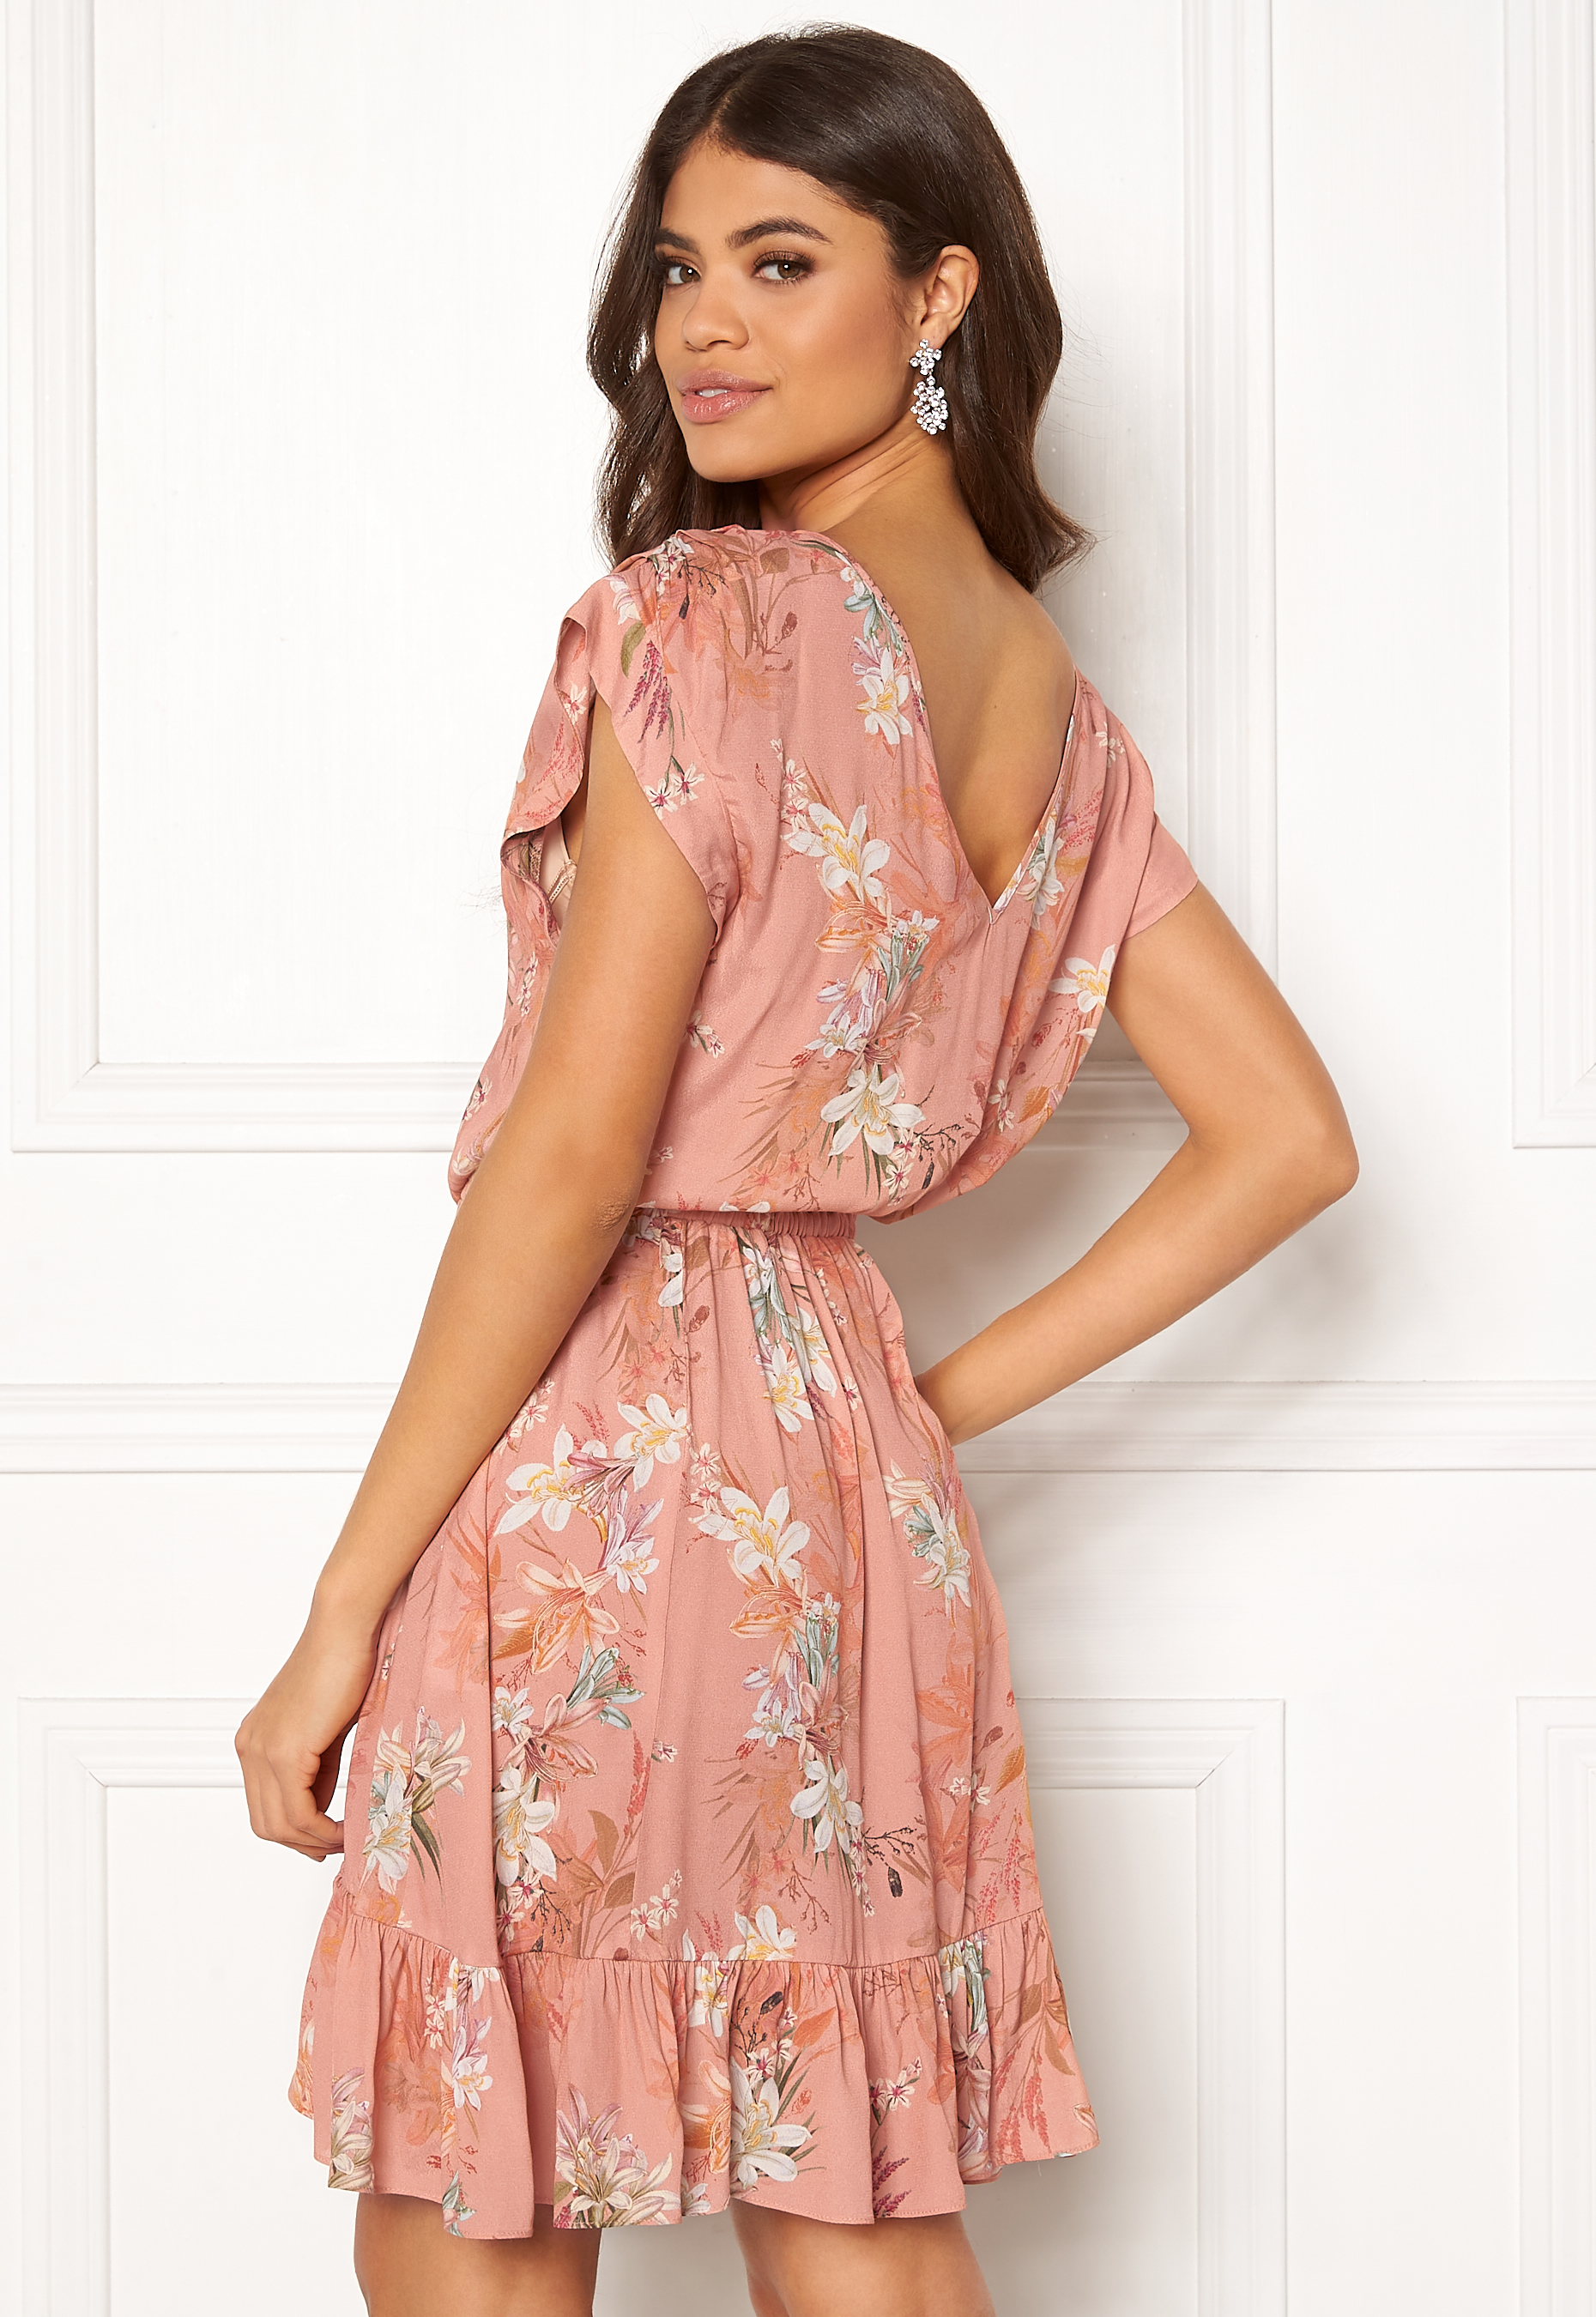 c4df0c872c5 Ravn Shea Dress Nude Flower - Bubbleroom